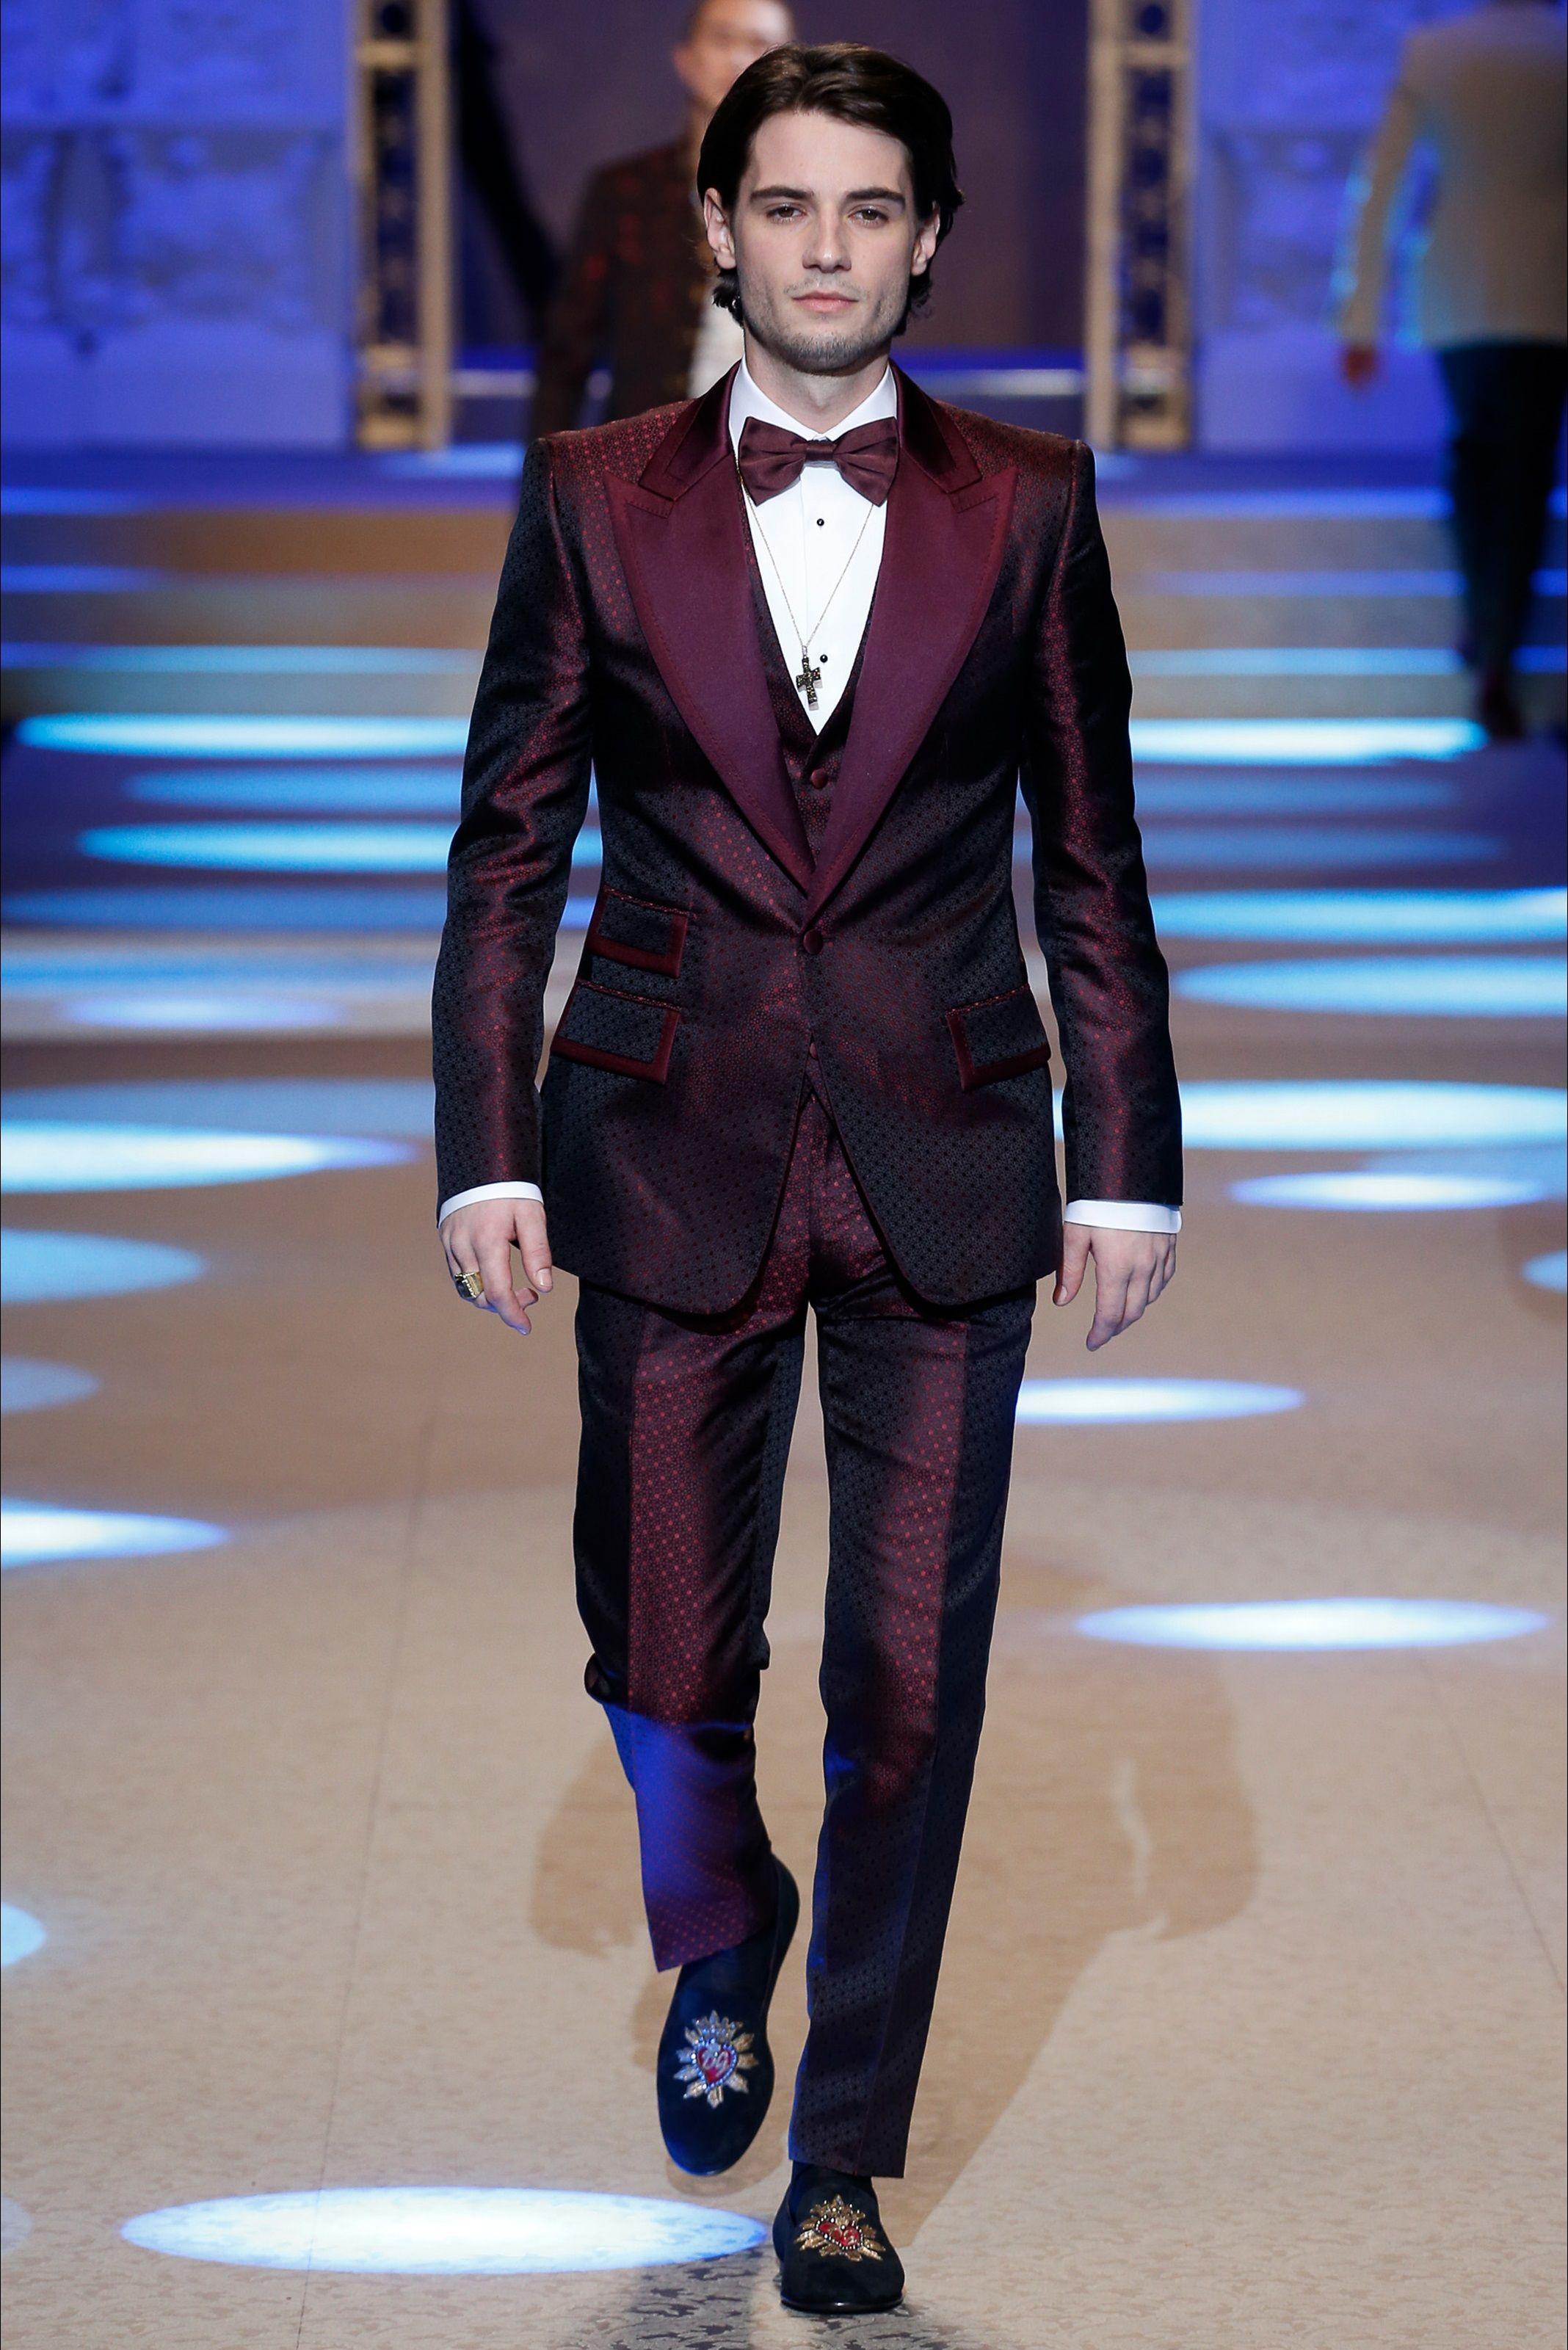 Living a Beautiful Life ~ Sfilata Moda Uomo Dolce   Gabbana Milano -  Autunno Inverno 2018-19 - Vogue a3eadf4997